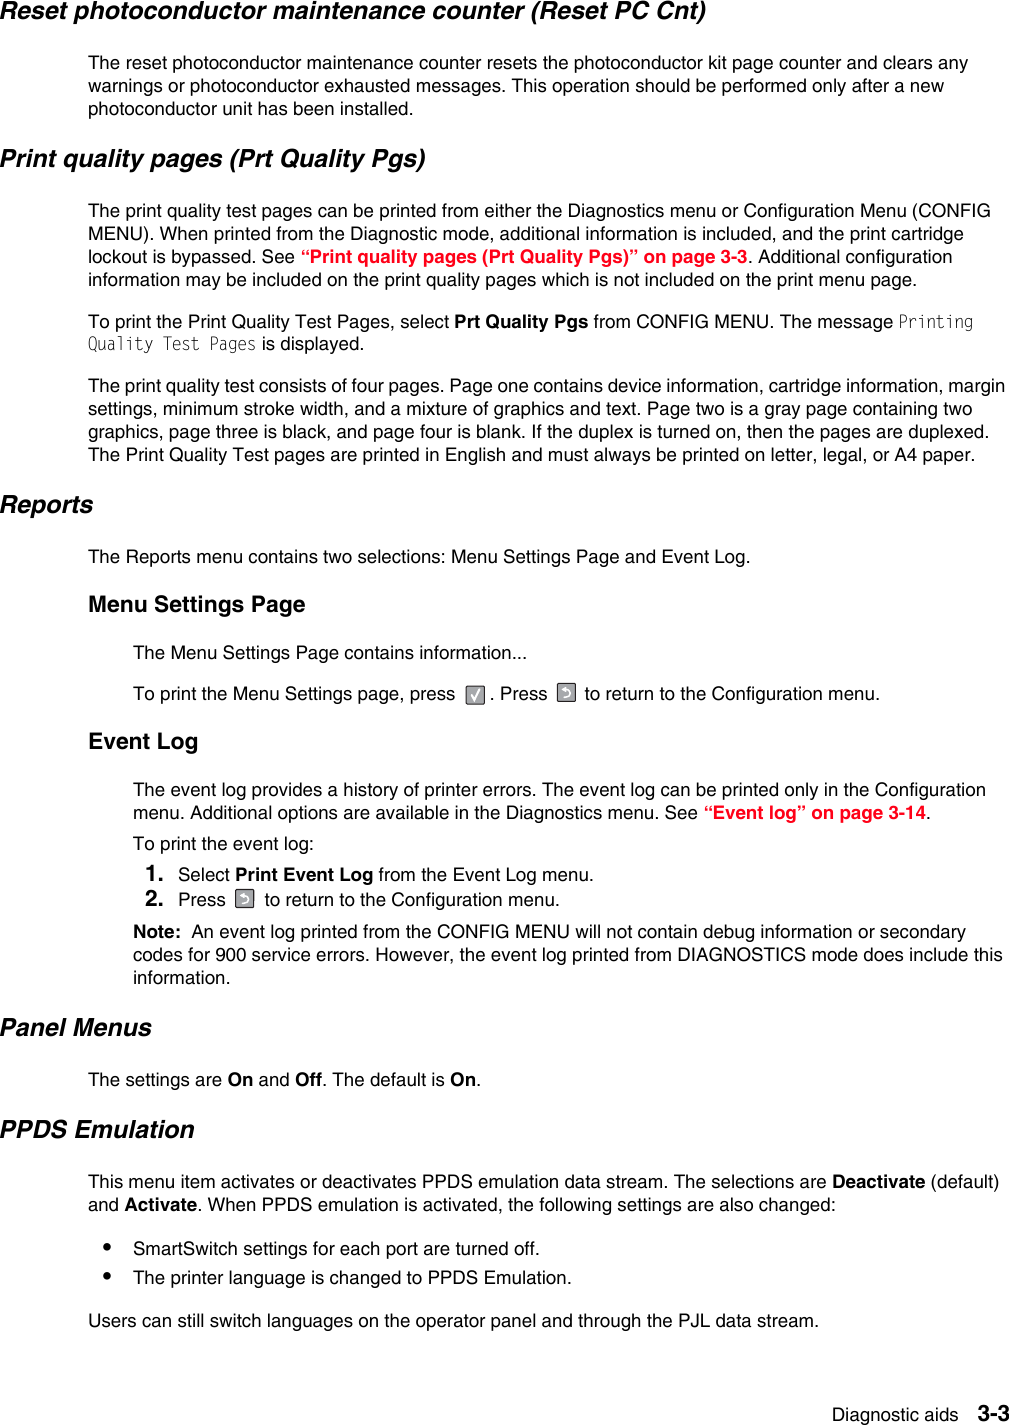 Dell Printer 2330Dn Users Manual 2330d/dn Service